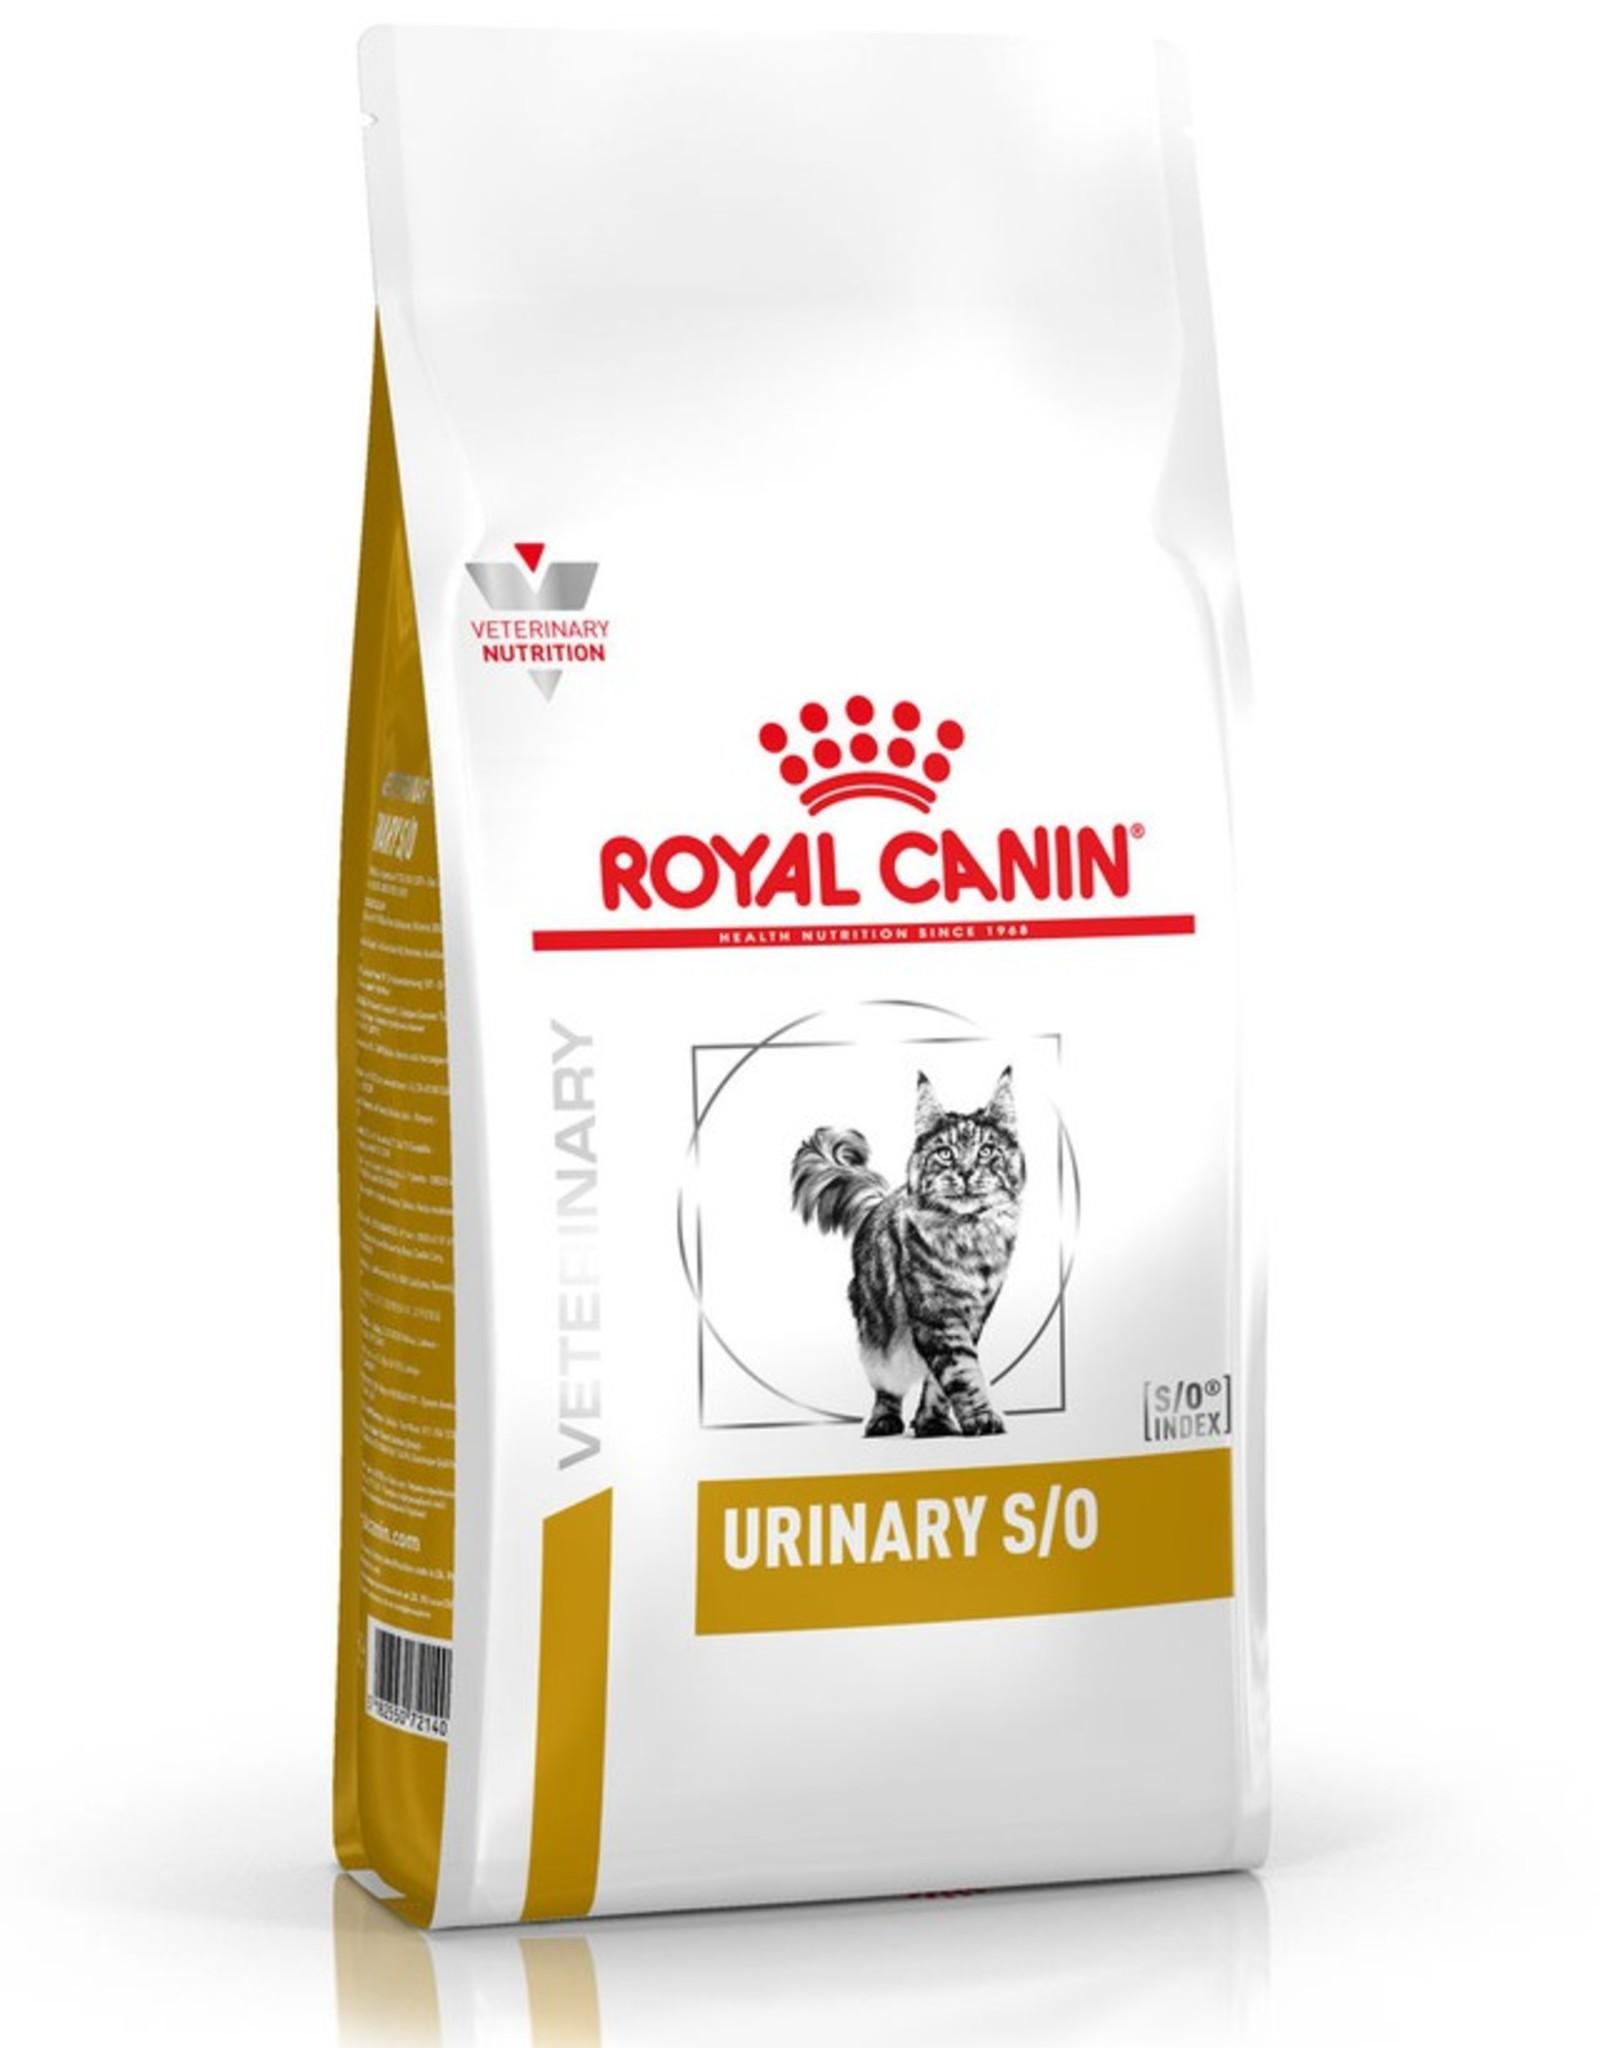 Royal Canin Royal Canin Urinary S/o Kat 7kg